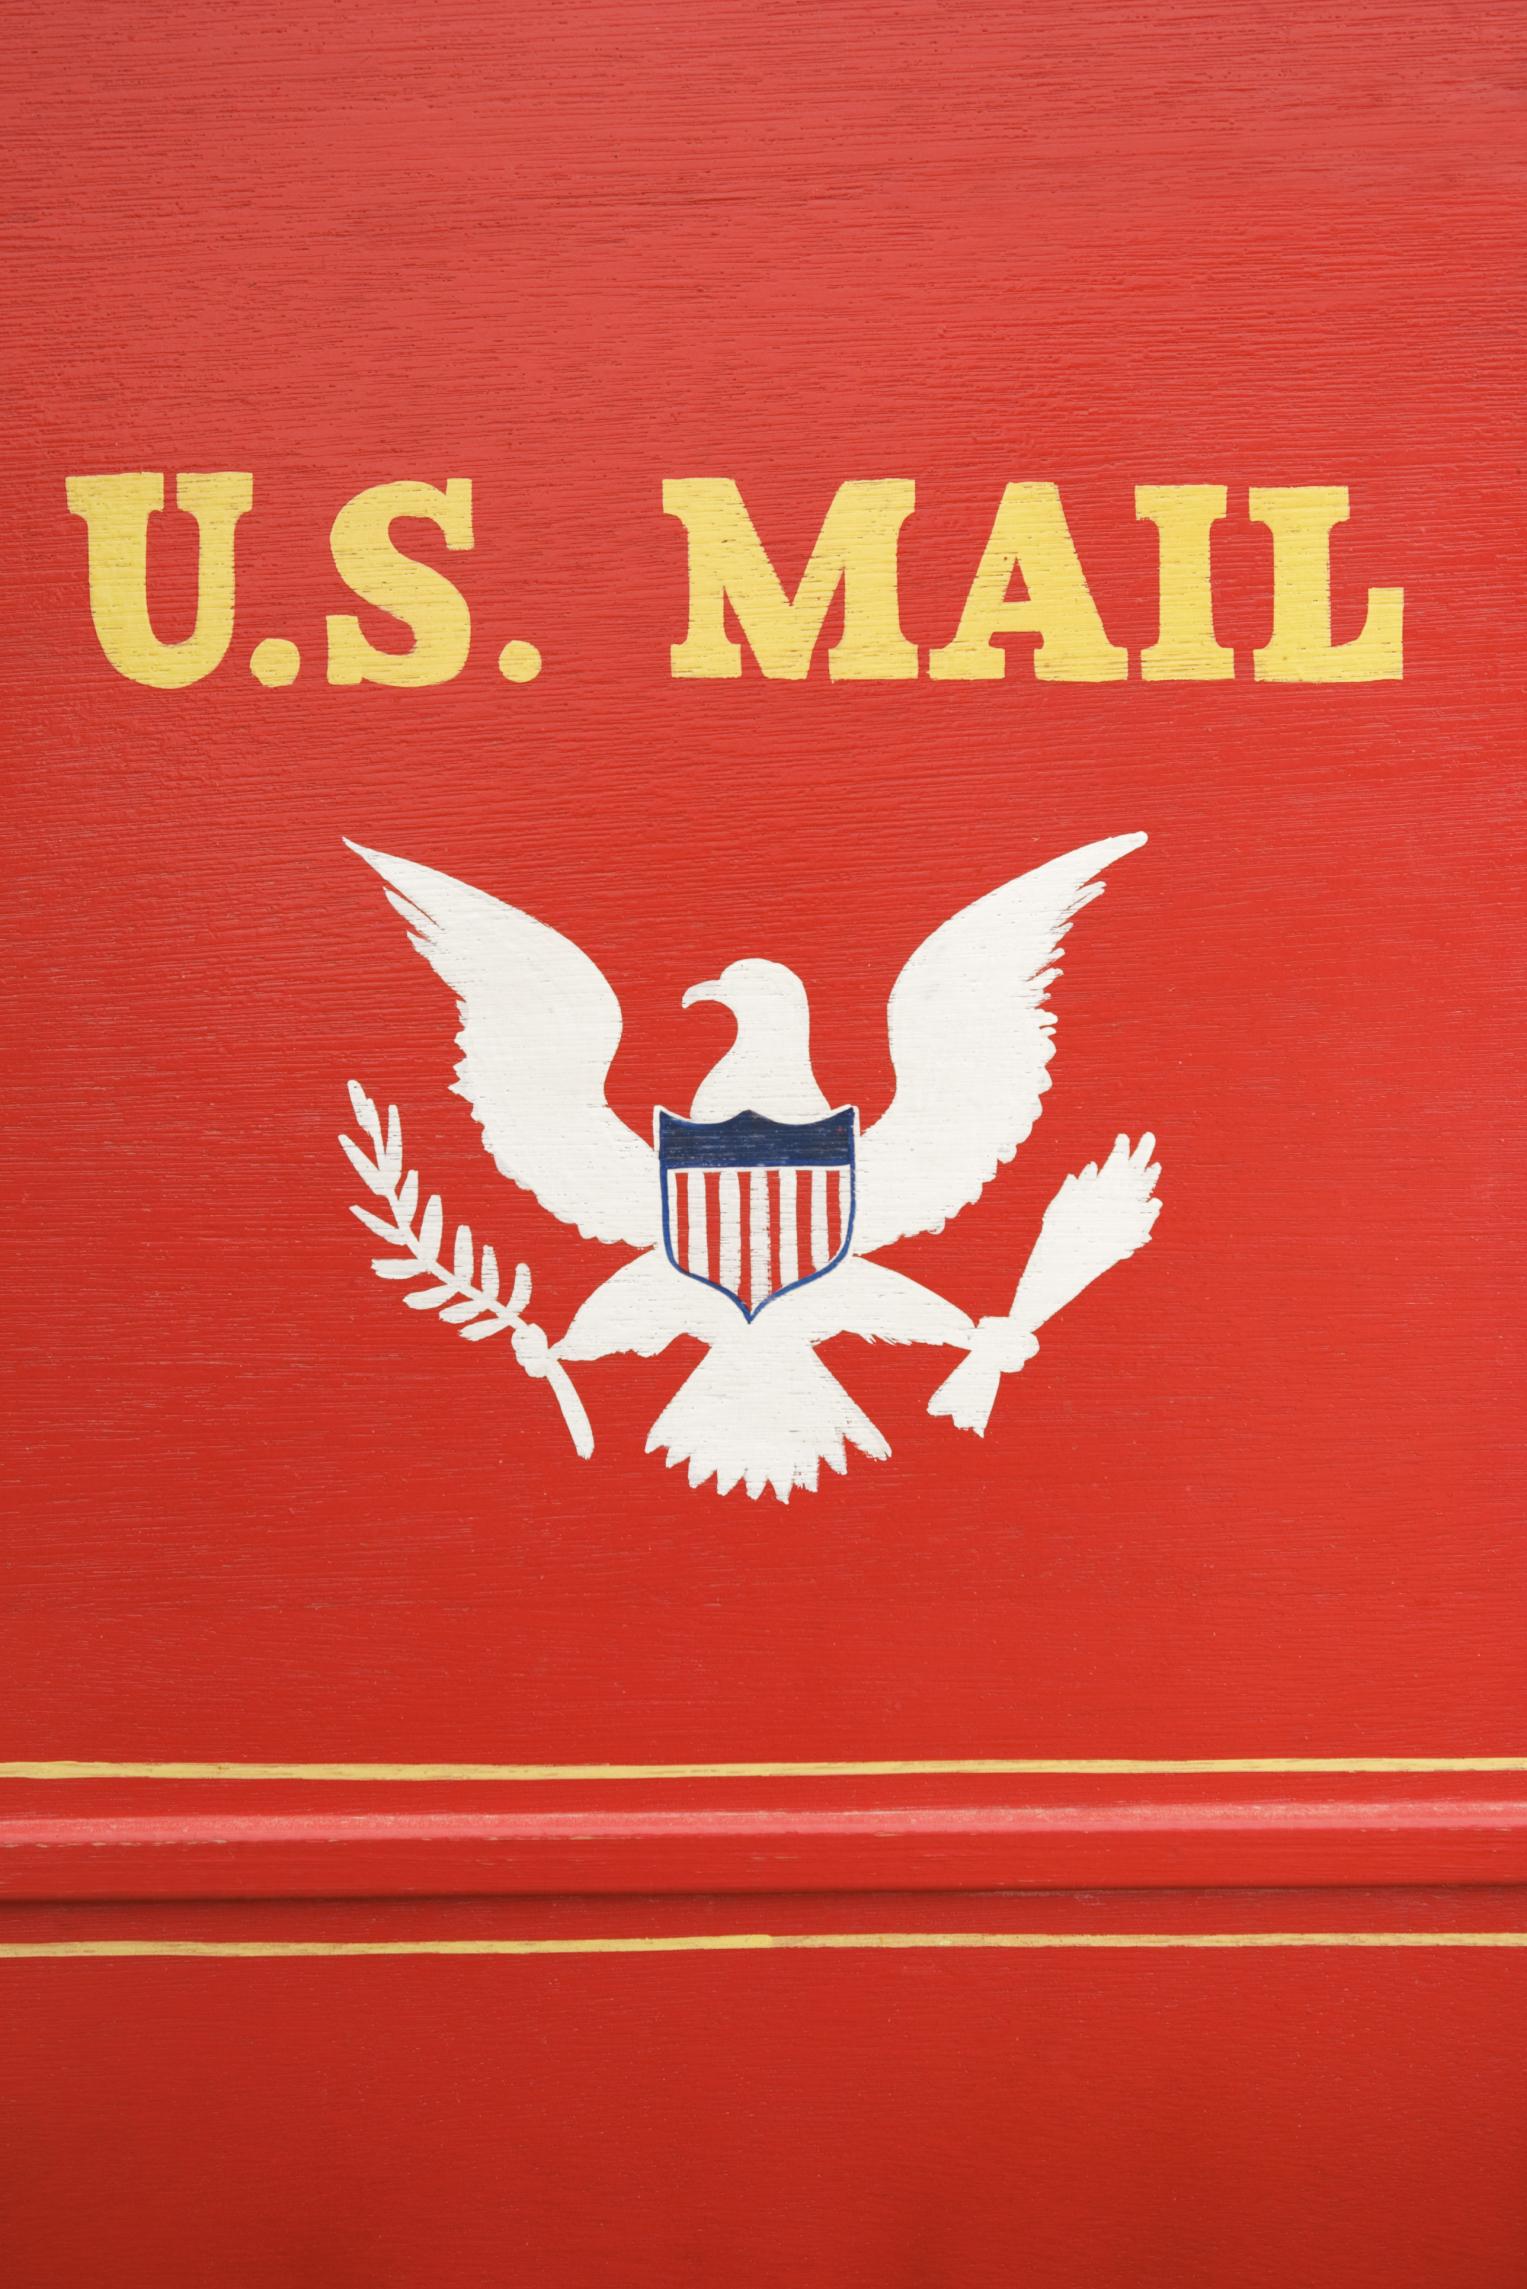 USSFOA Customs   Bizfluent